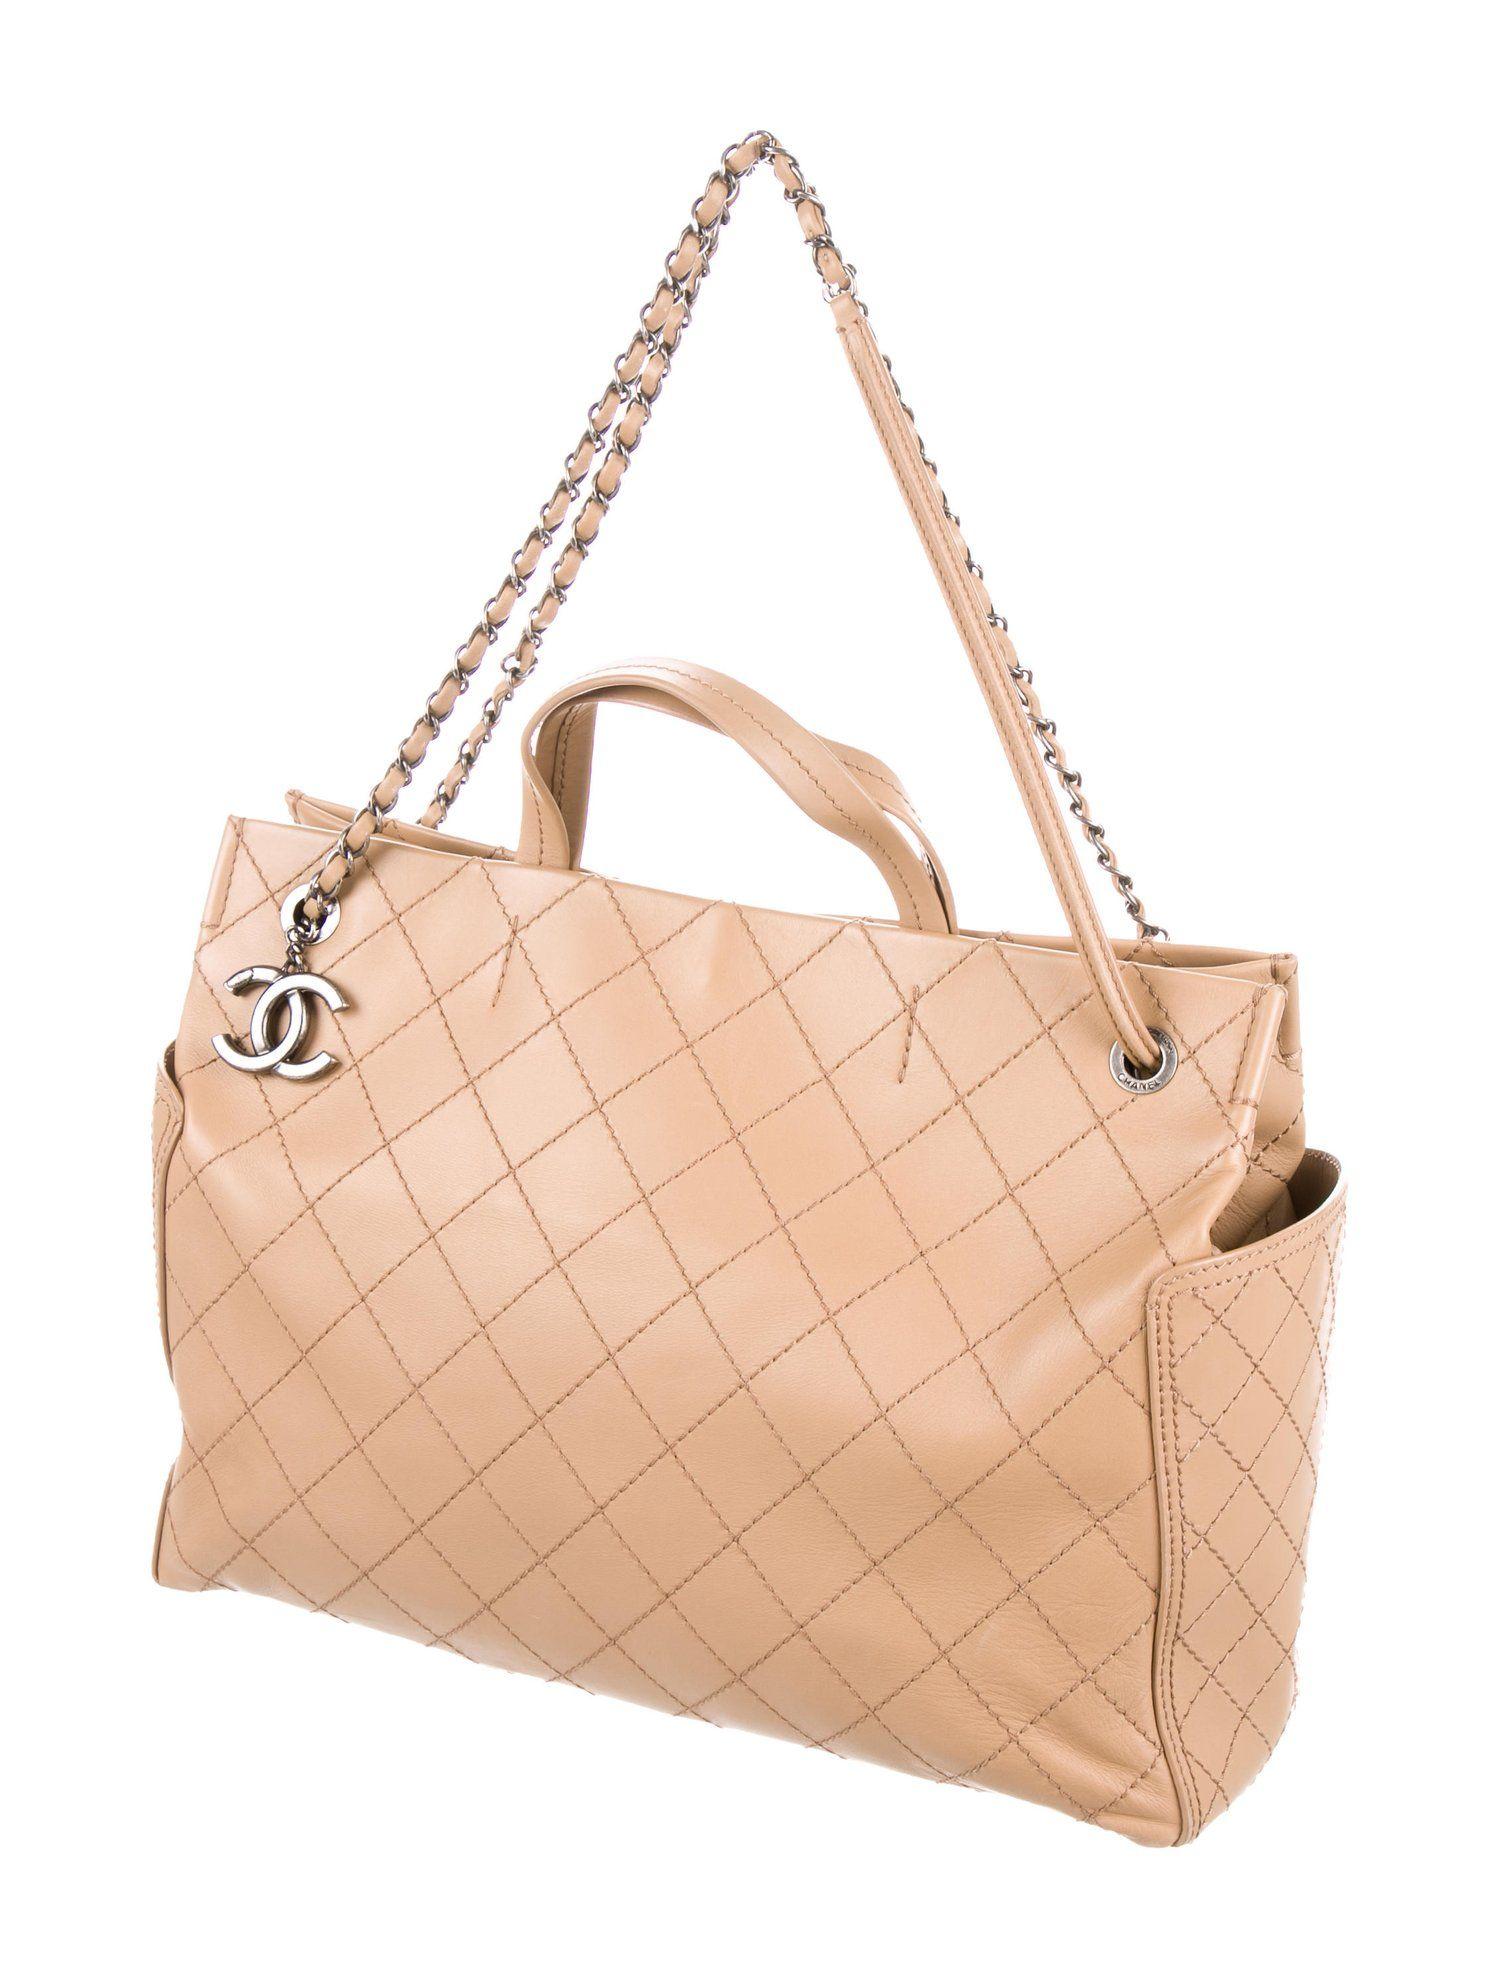 942cc95a92a7 Chanel CC Pocket Tote - Handbags - CHA240889 | The RealReal